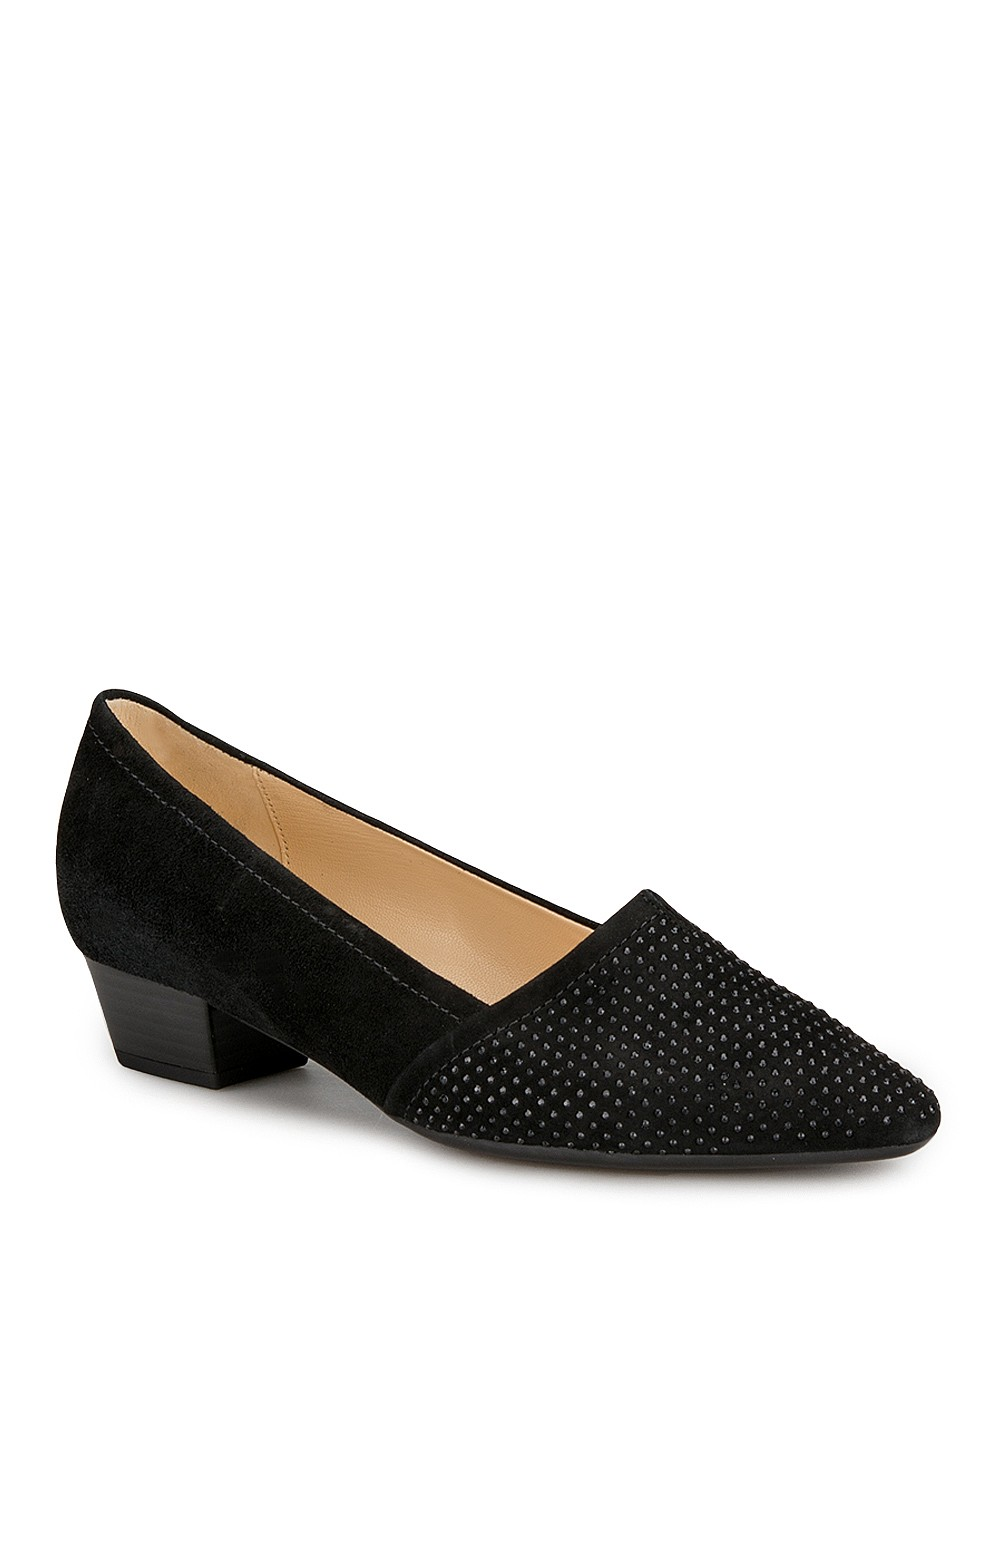 e921c715f0904 Gabor Sequin Toe Shoe - House of Bruar